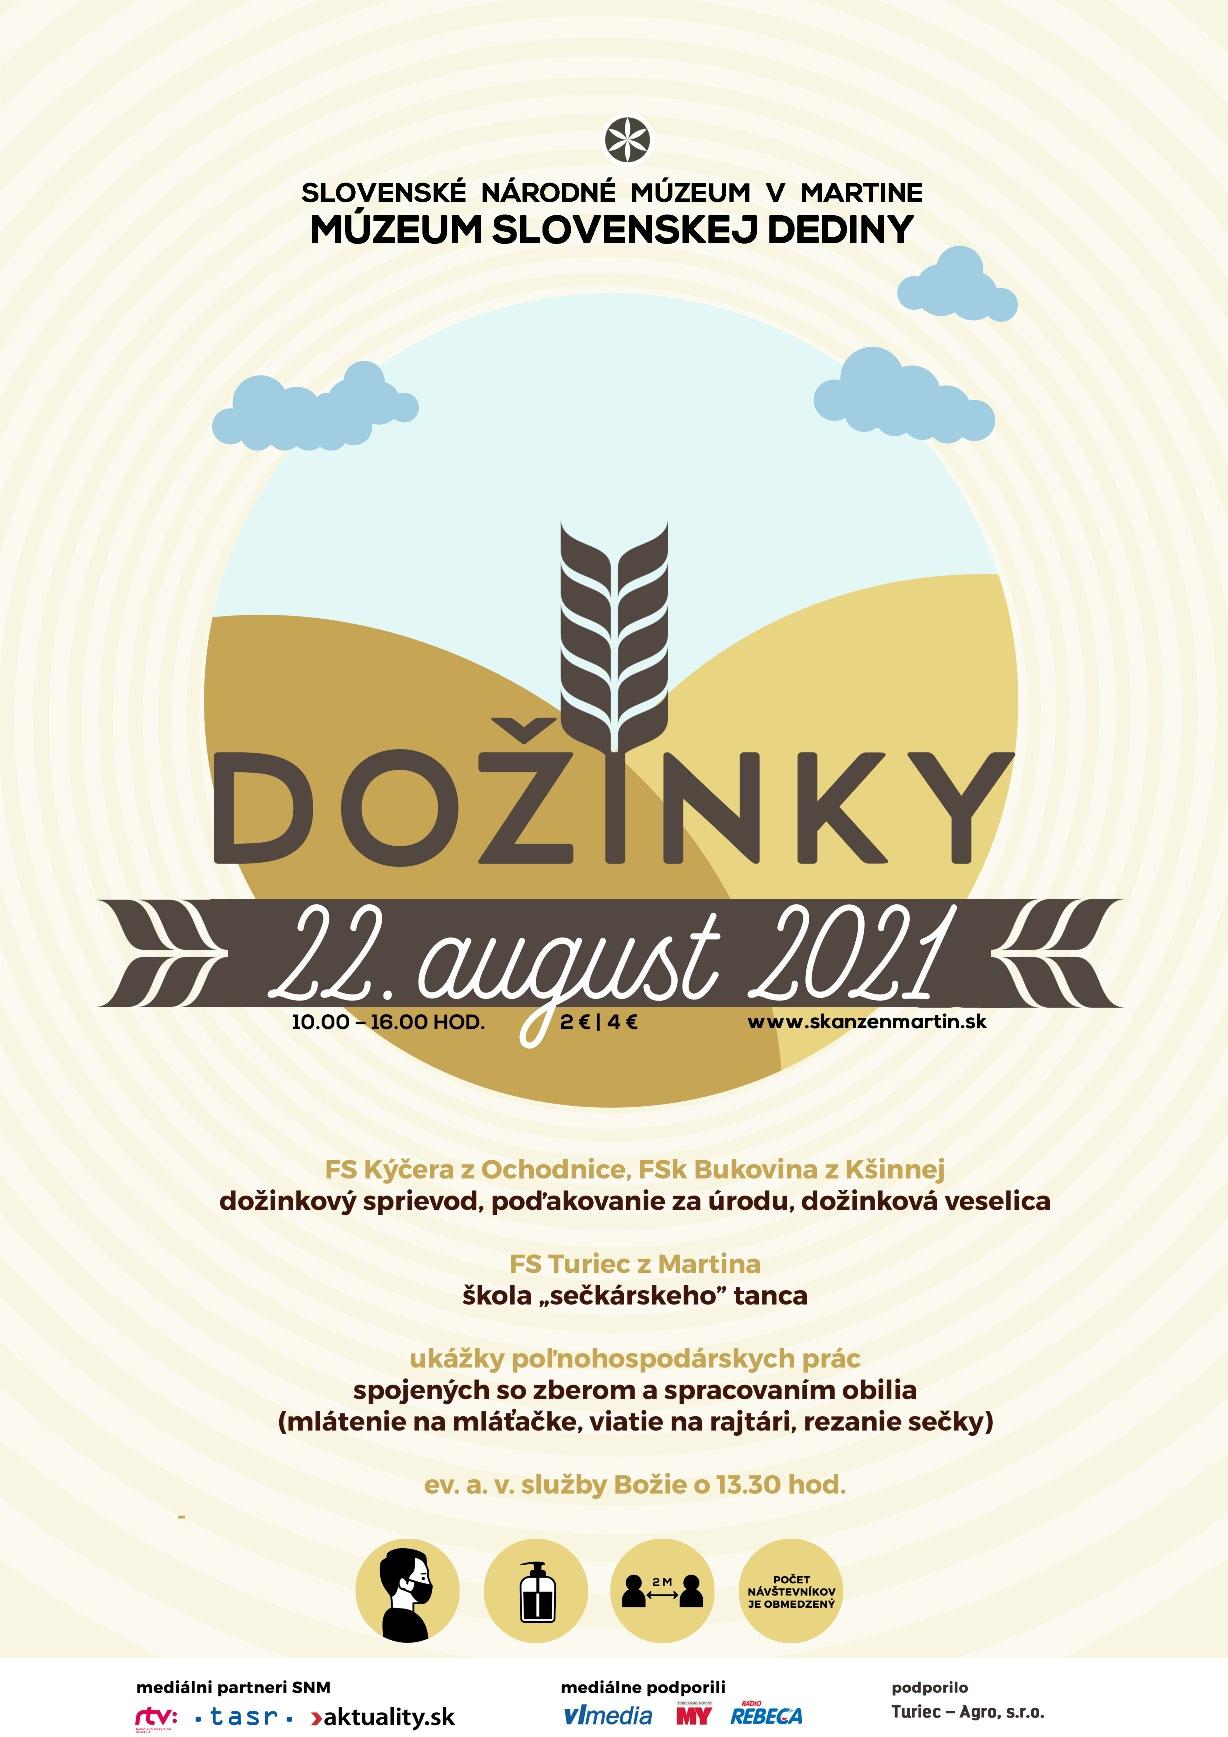 , V Múzeu slovenskej dediny uvidíte ukážky poľnohospodárskych prác a dožinkové slávnosti